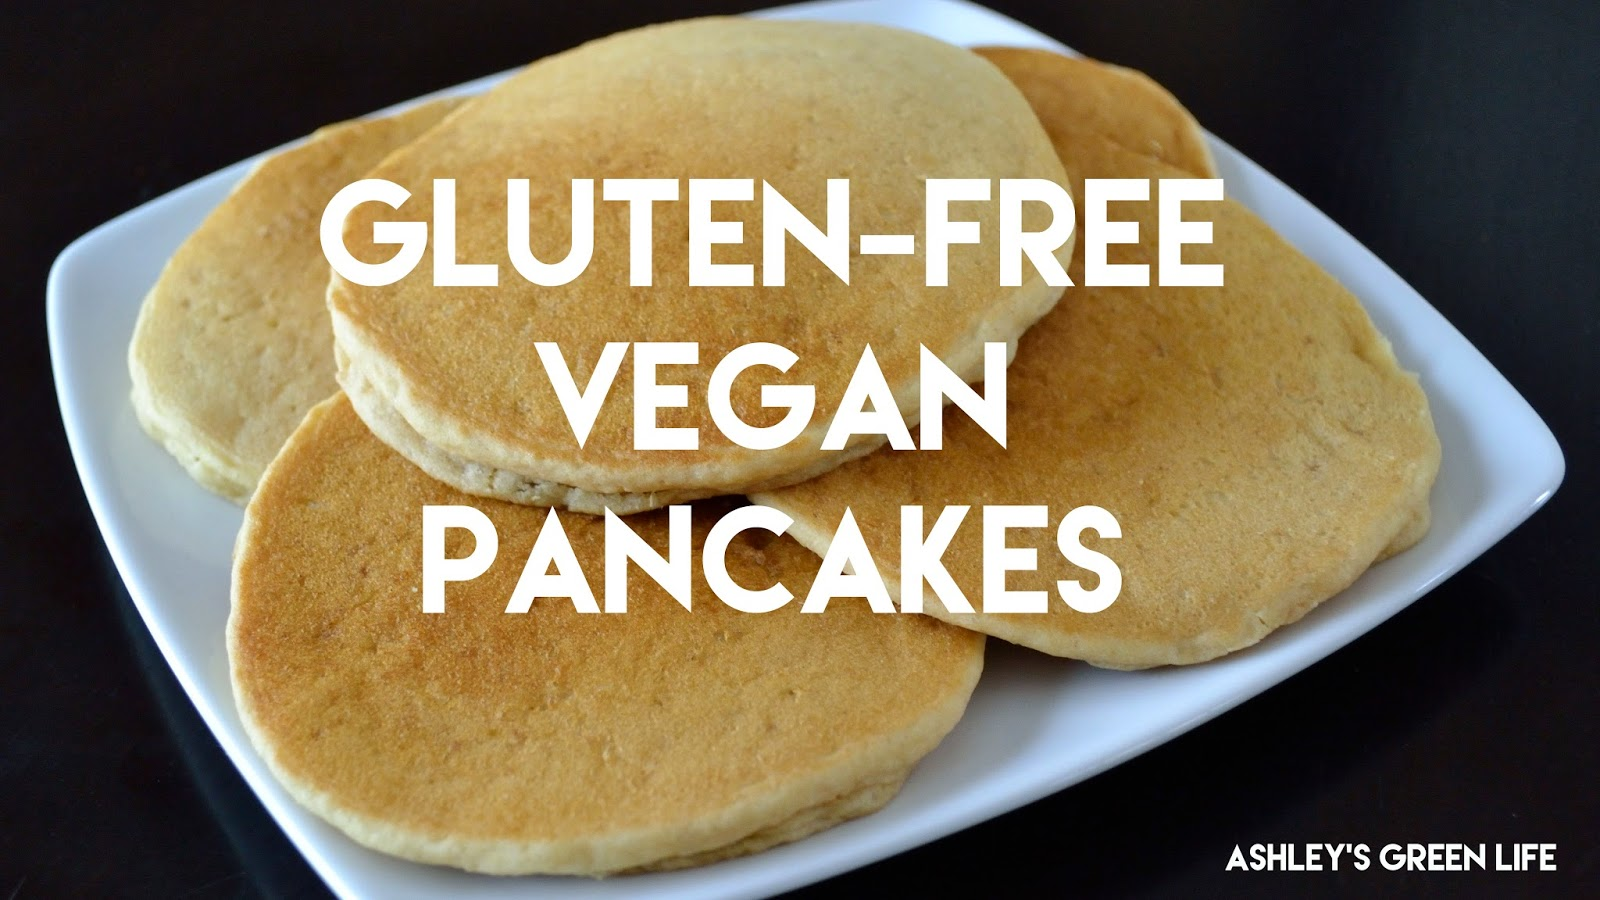 Ashleys Green Life GlutenFree Vegan Pancakes